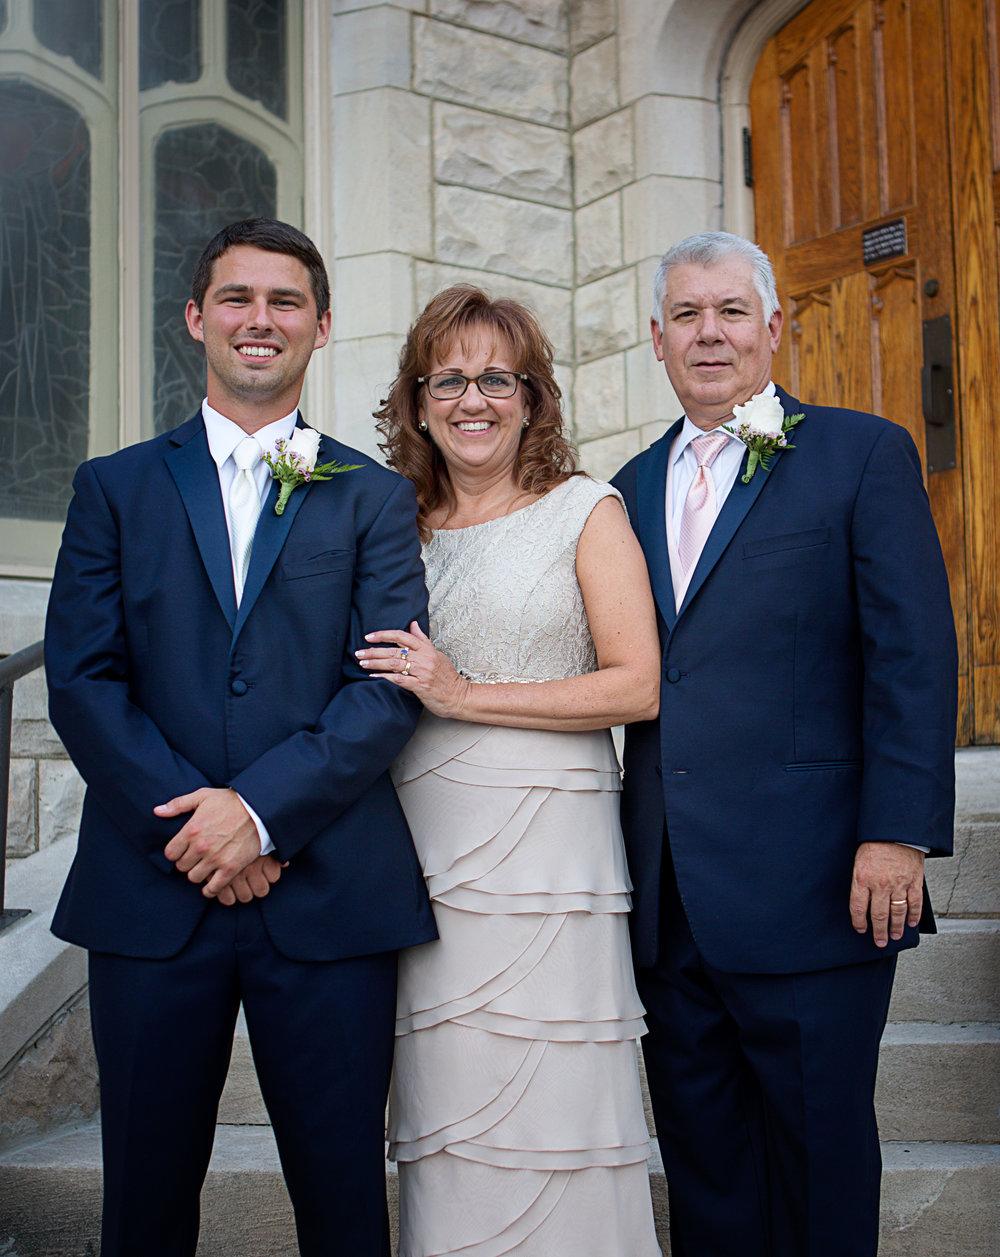 Southall Wedding 0251.jpg